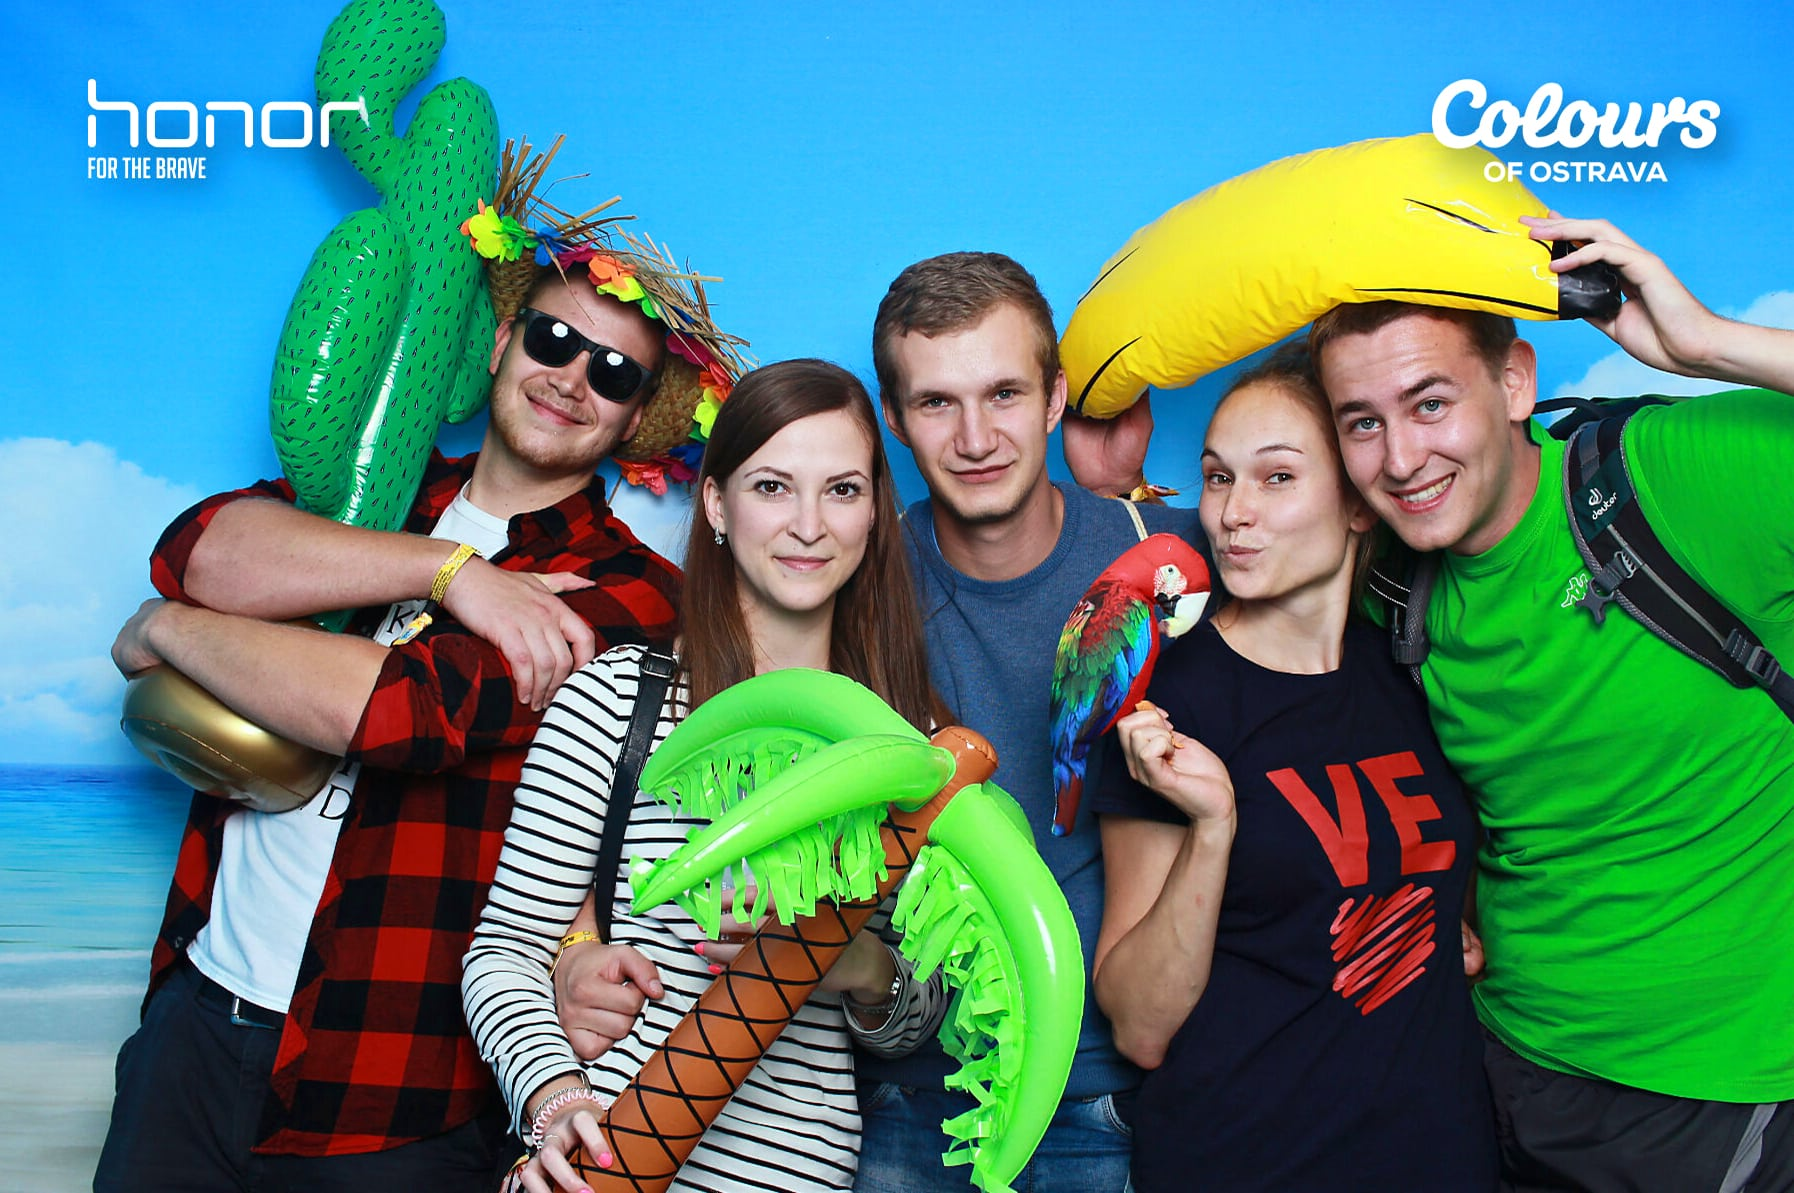 fotokoutek-festival-ostrava-honor-colours-of-ostrava-19-7-2018-462355